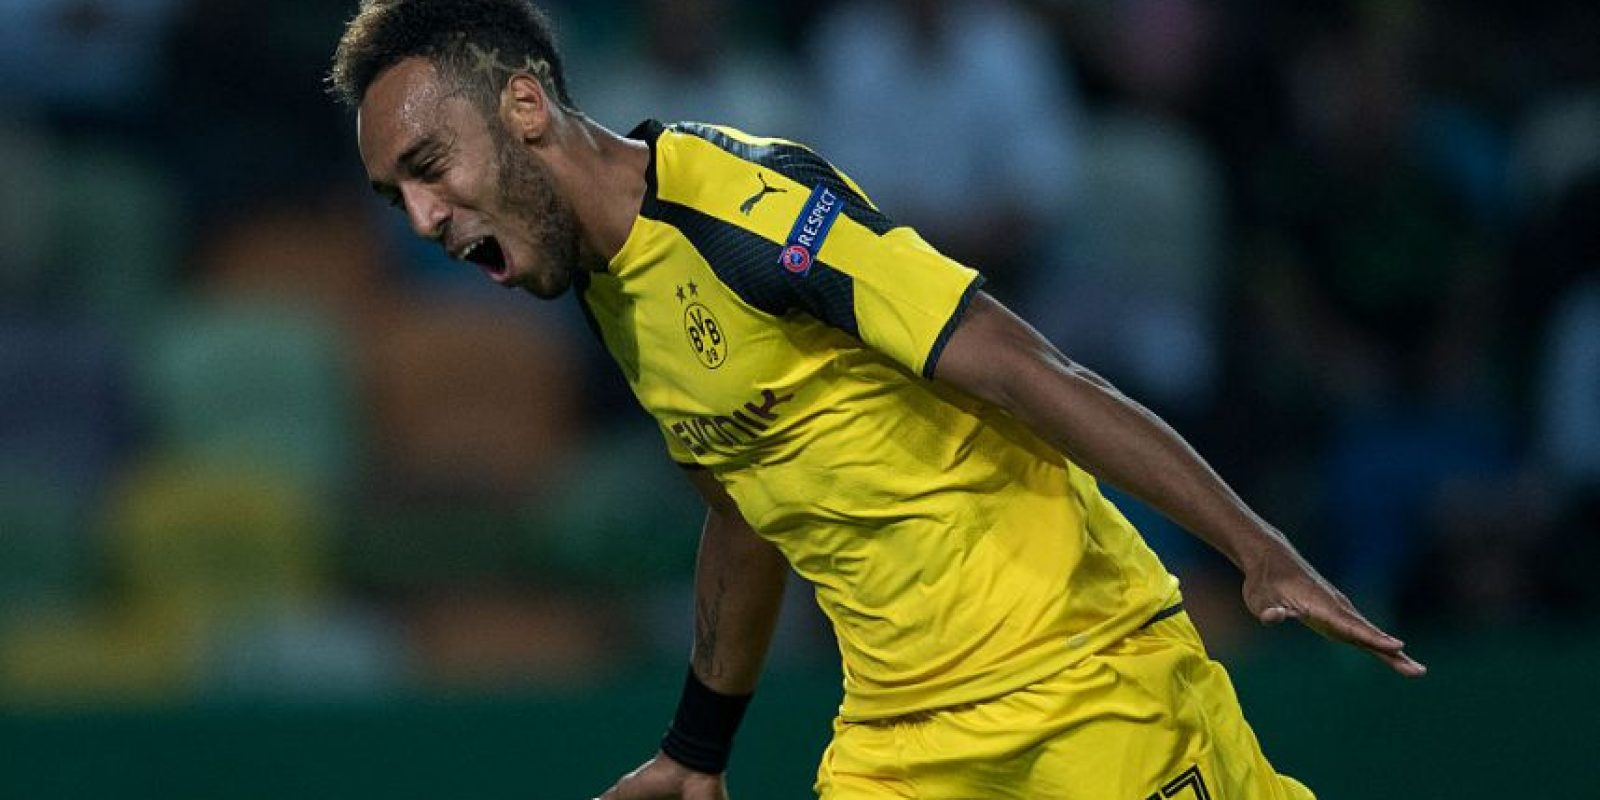 Pierre-Emerick AUbameyang (Borussia Dortmund) Foto:Getty Images